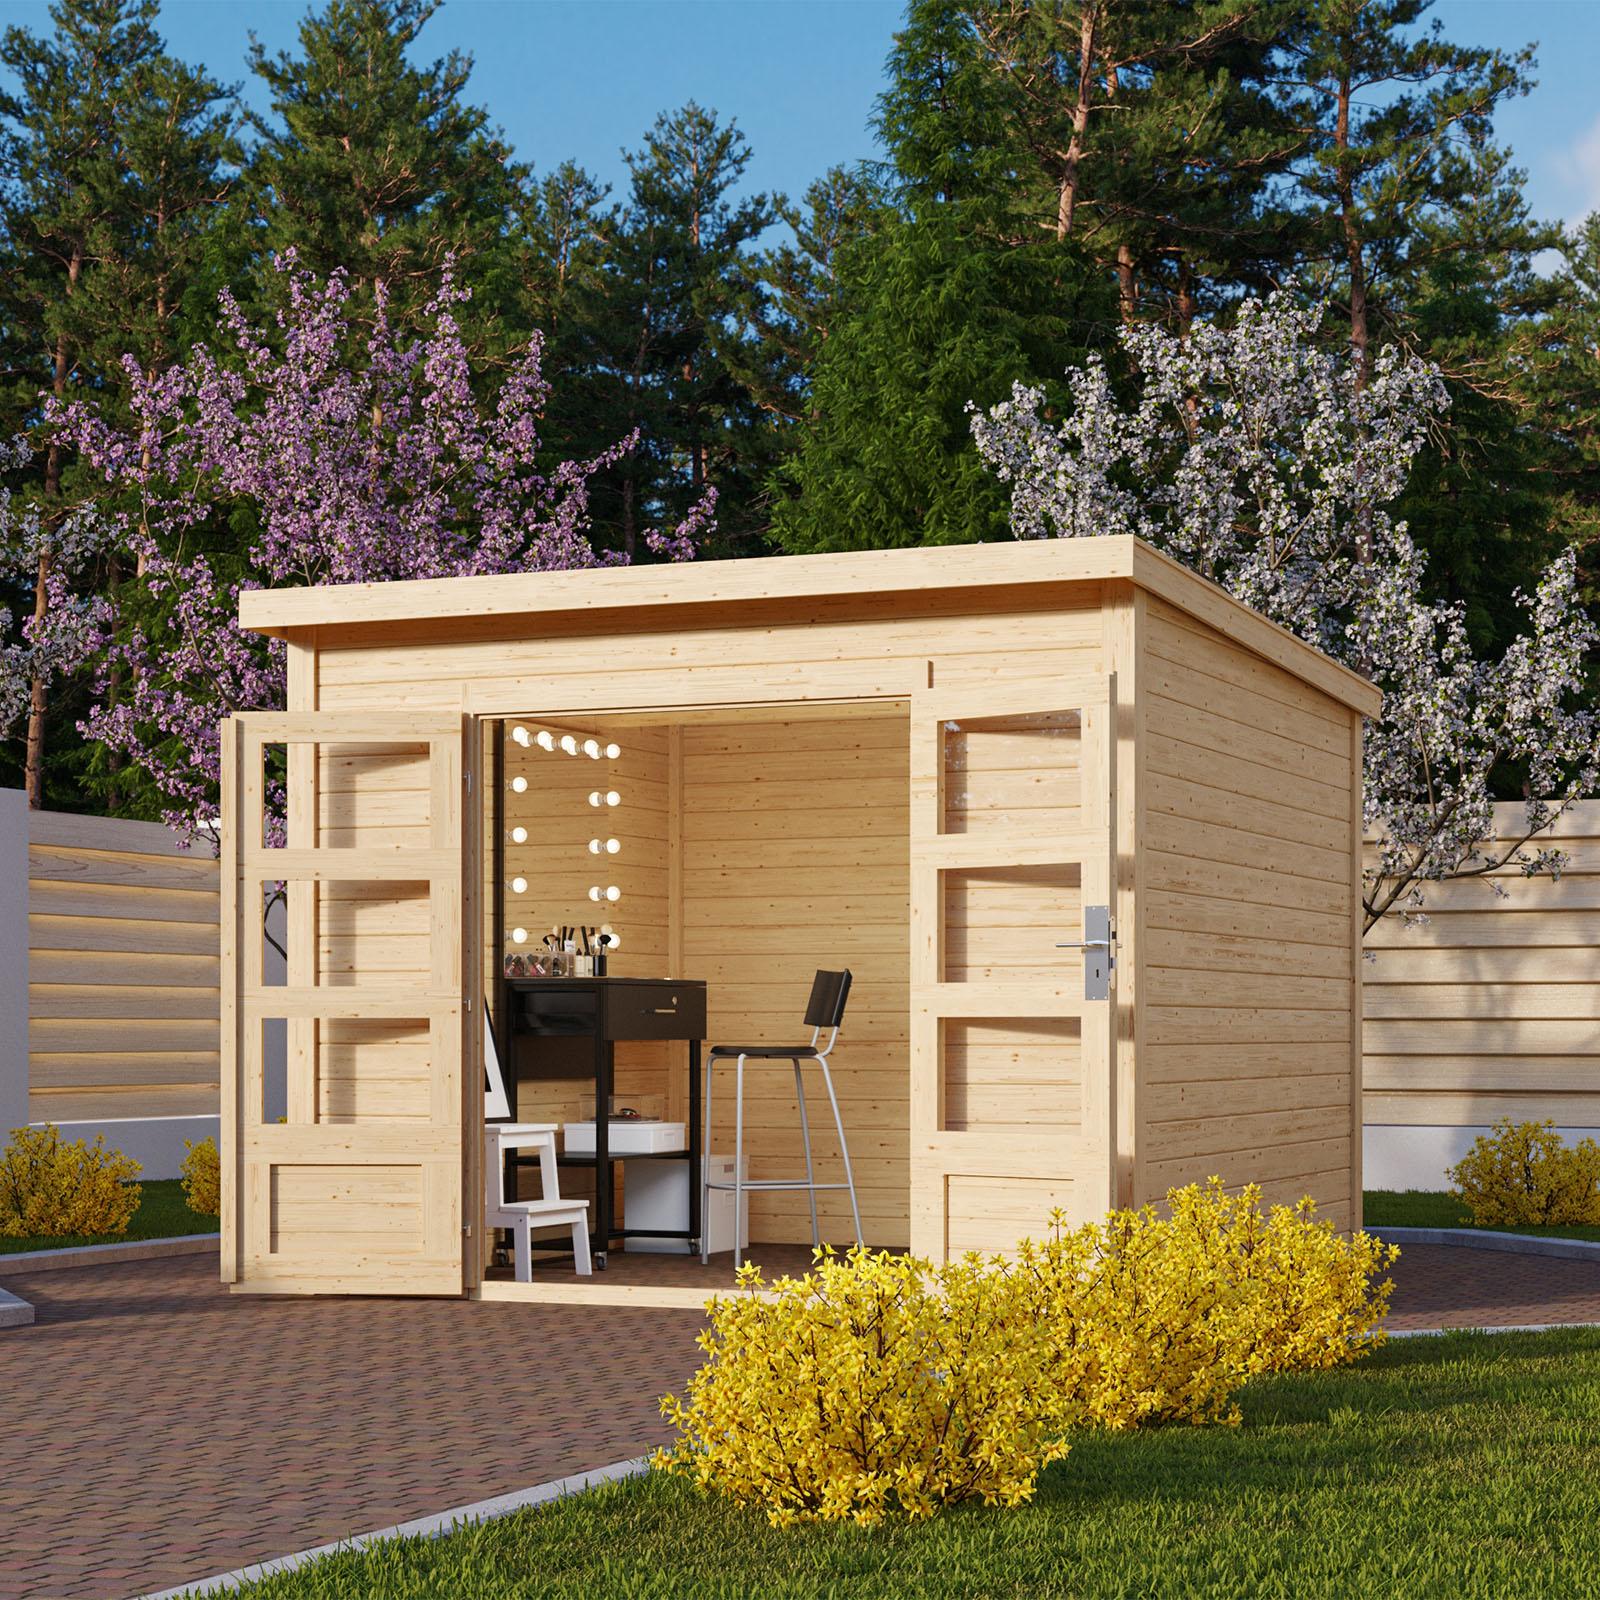 Gartenhaus 28 mm Holzhaus mit Anbau Gerätehaus Schuppen